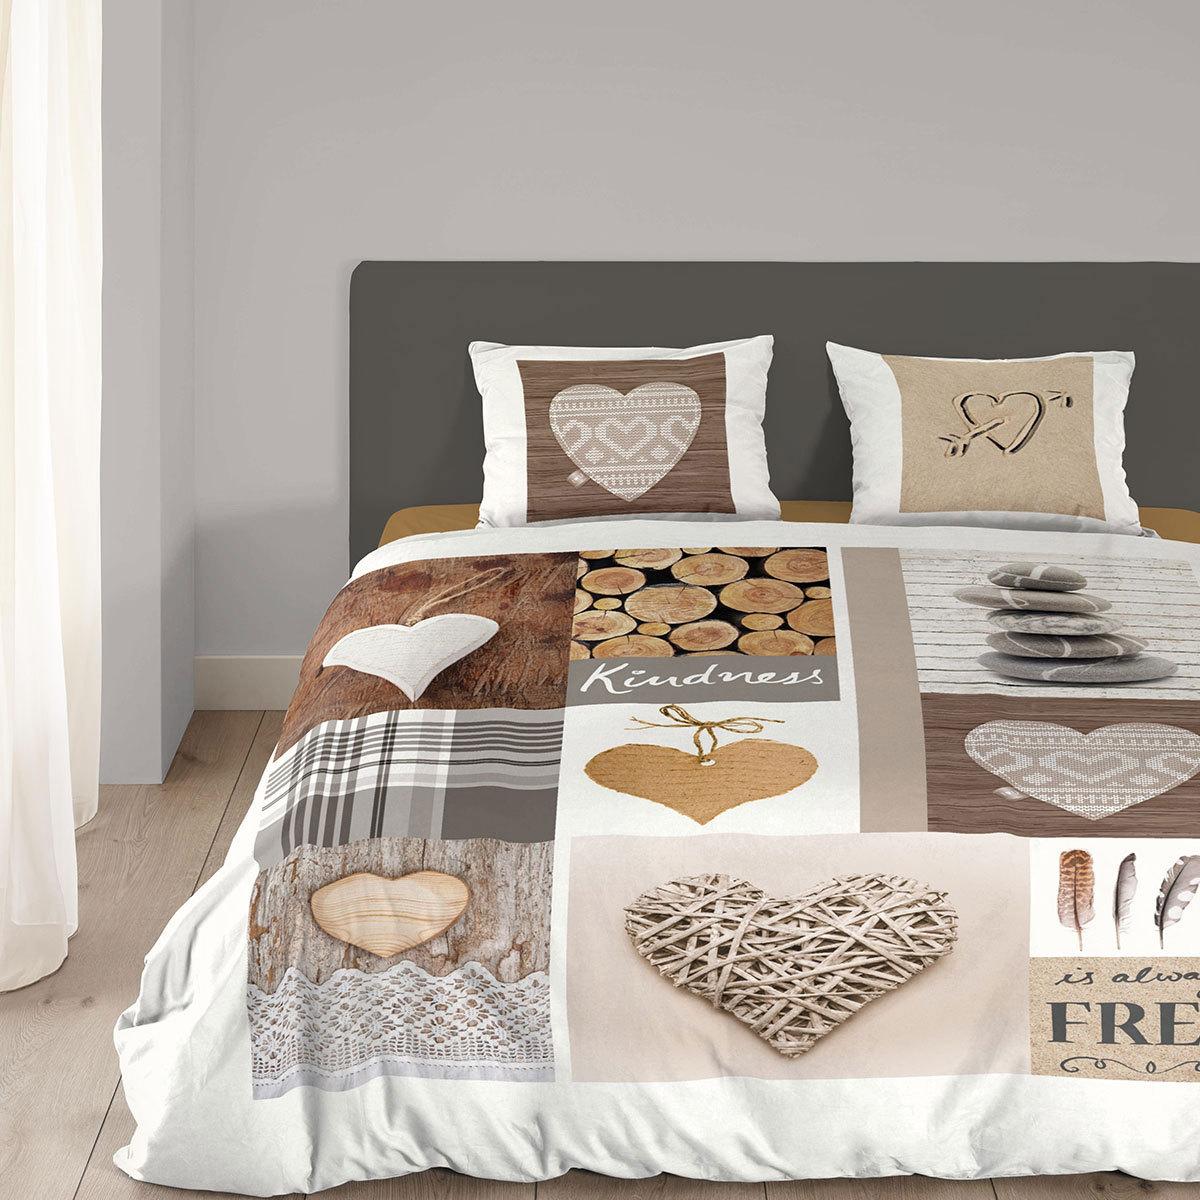 good morning flanell bettw sche nature g nstig online kaufen bei bettwaren shop. Black Bedroom Furniture Sets. Home Design Ideas